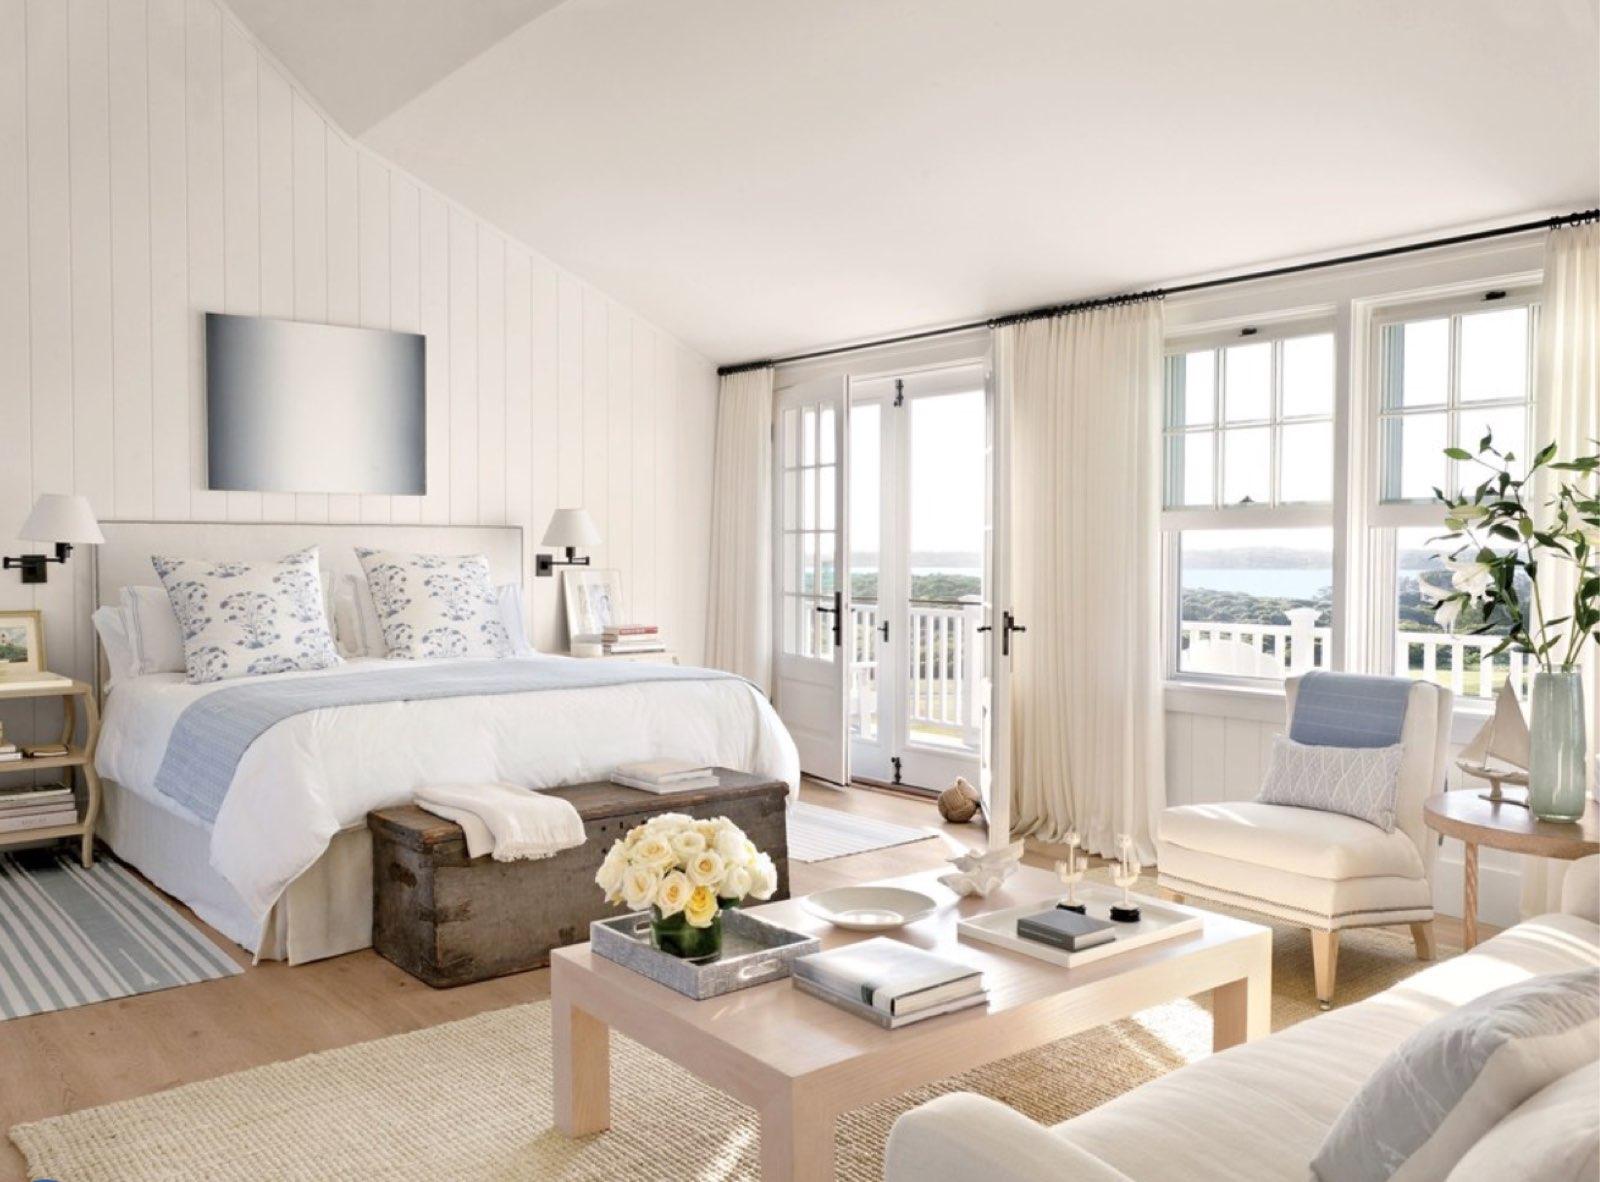 Victoria Hagen's Classic Nantucket Home Photos | Architectural Digest-2.jpg